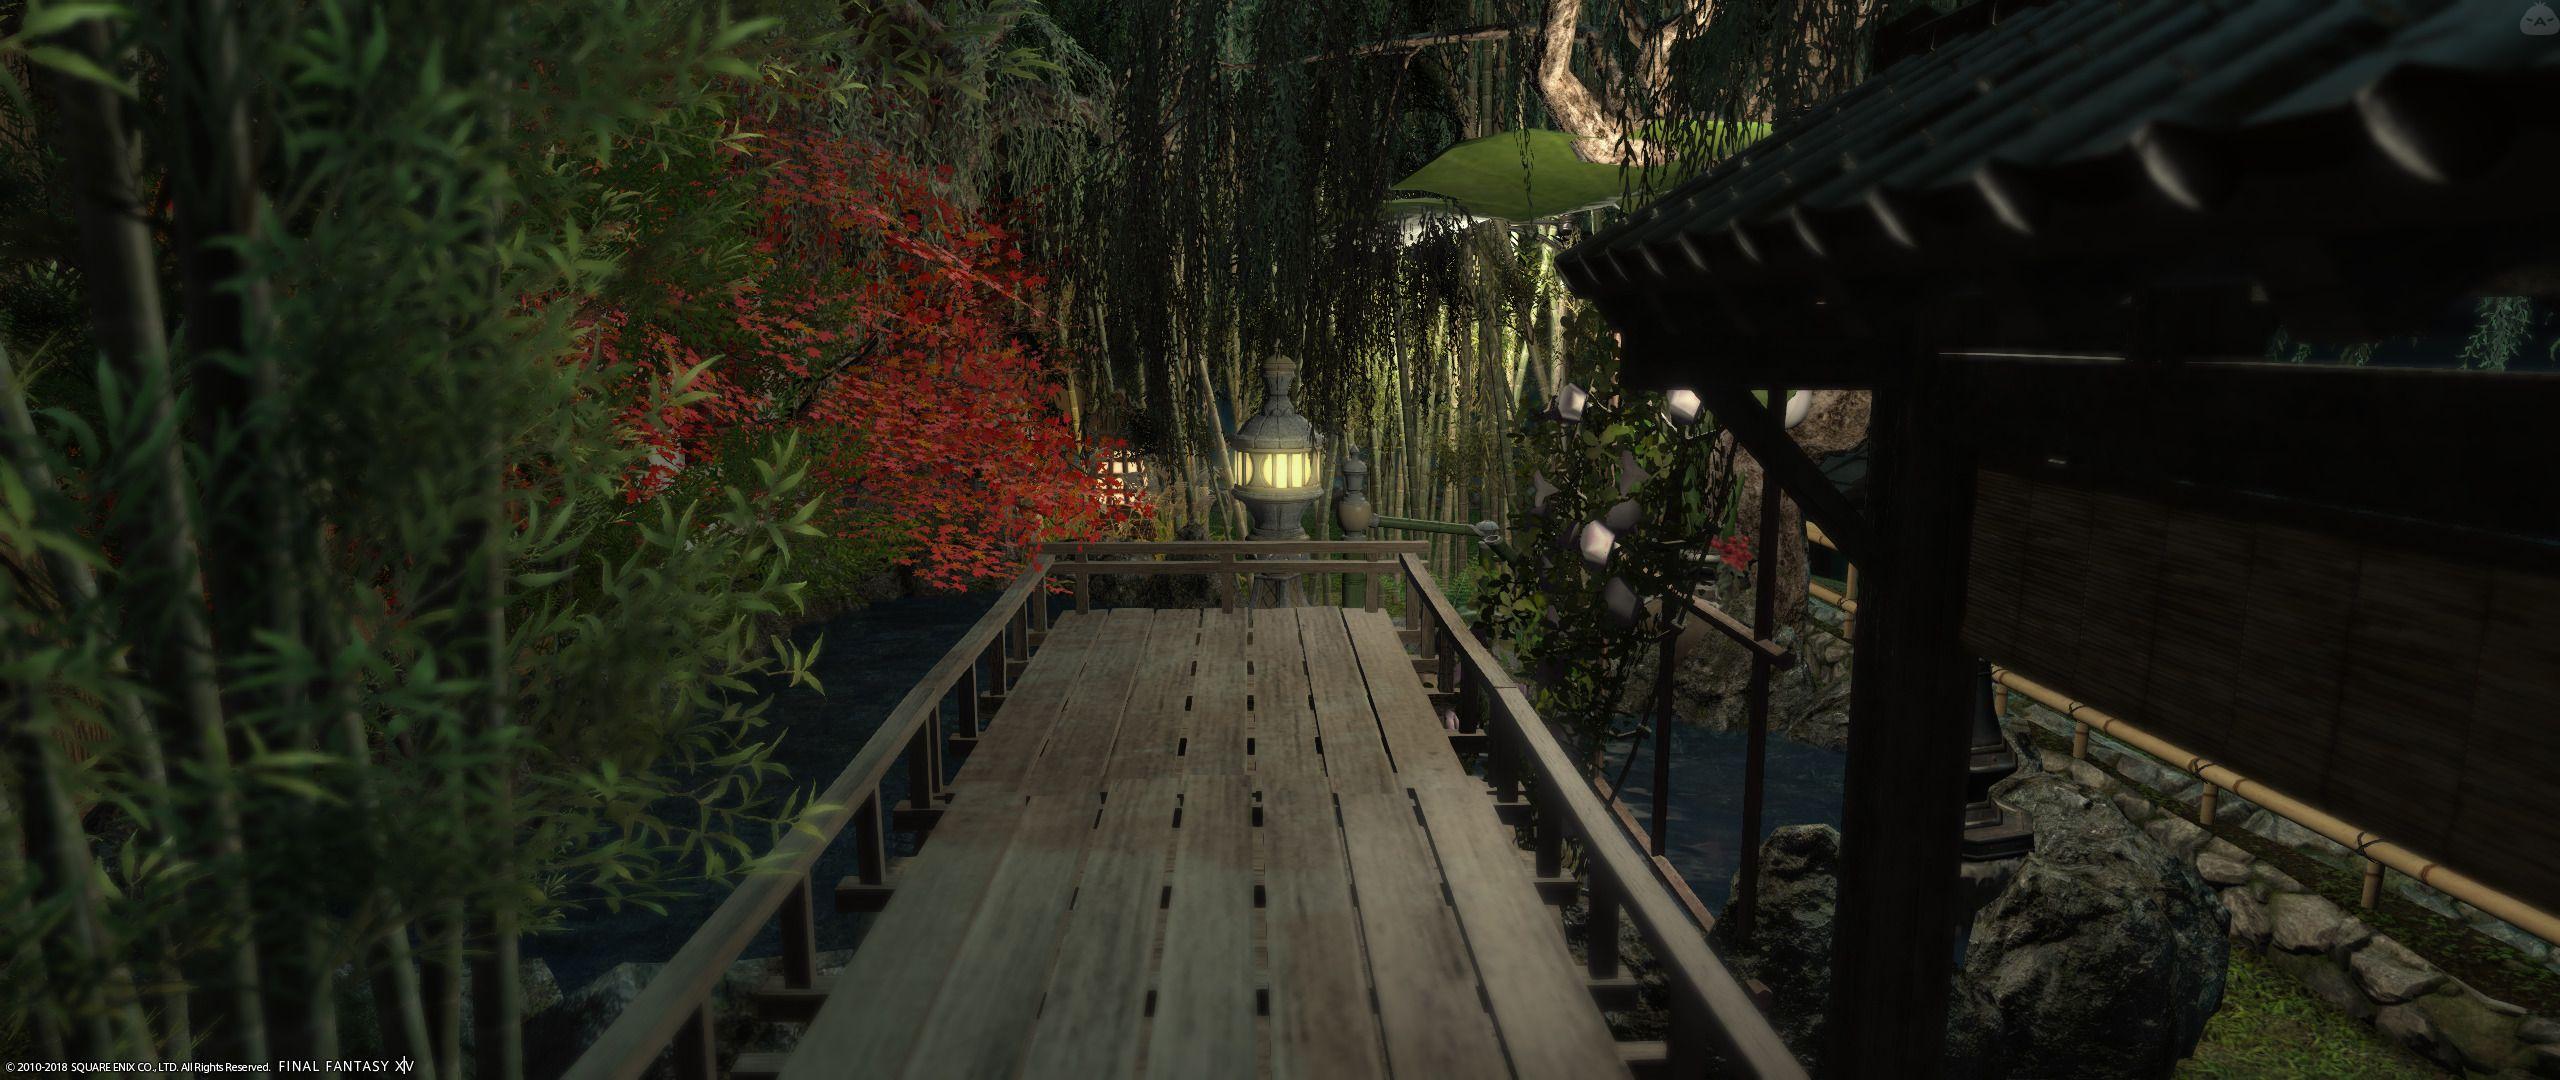 5ff1276f0b497c3de46073de630b25c1 Watermark 日本庭園 和風庭園 風景